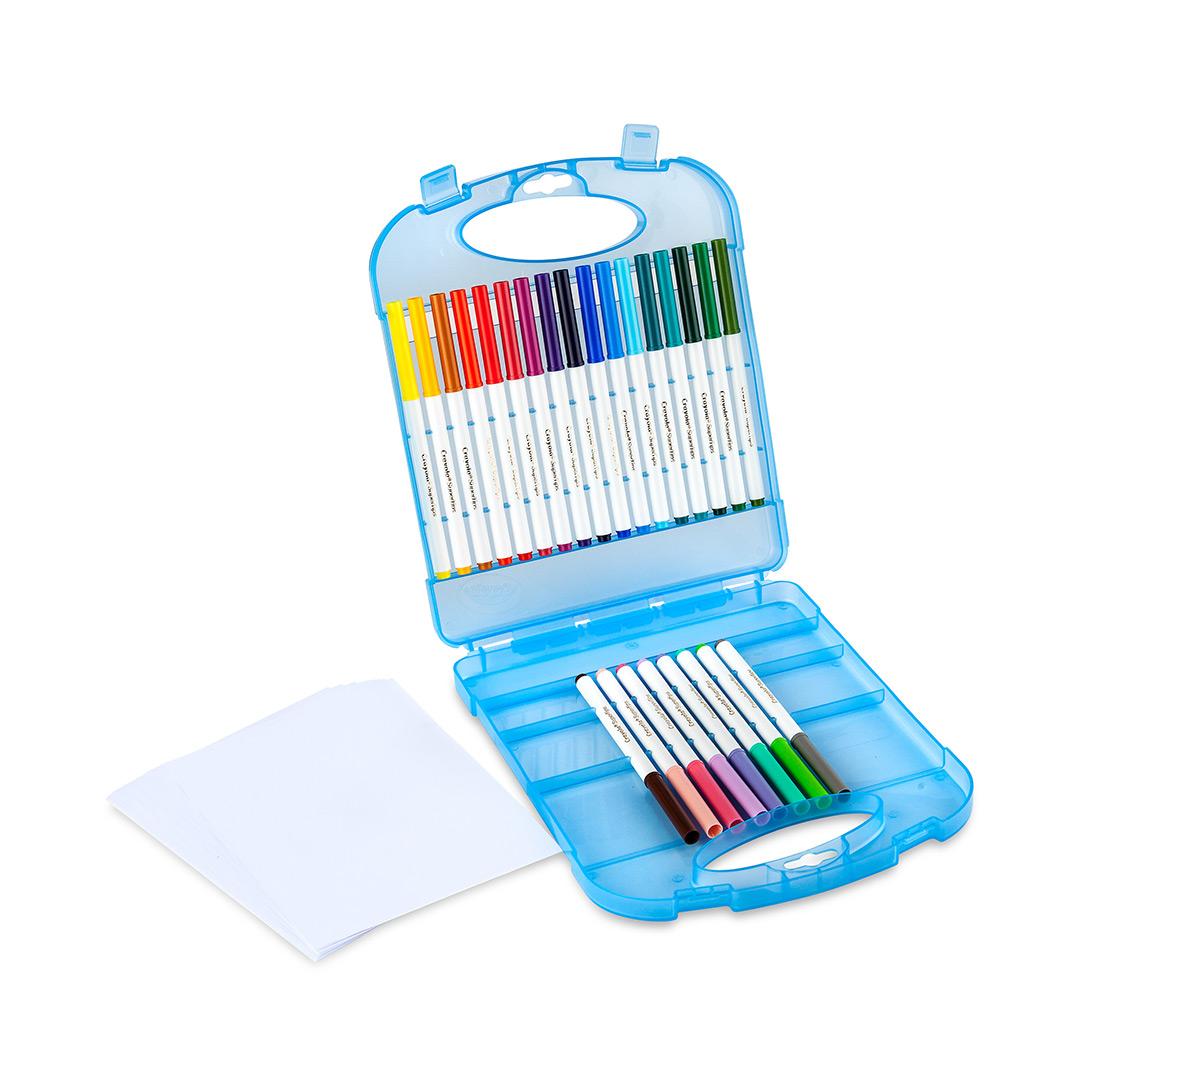 Supertips Washable Markers Amp Paper Set